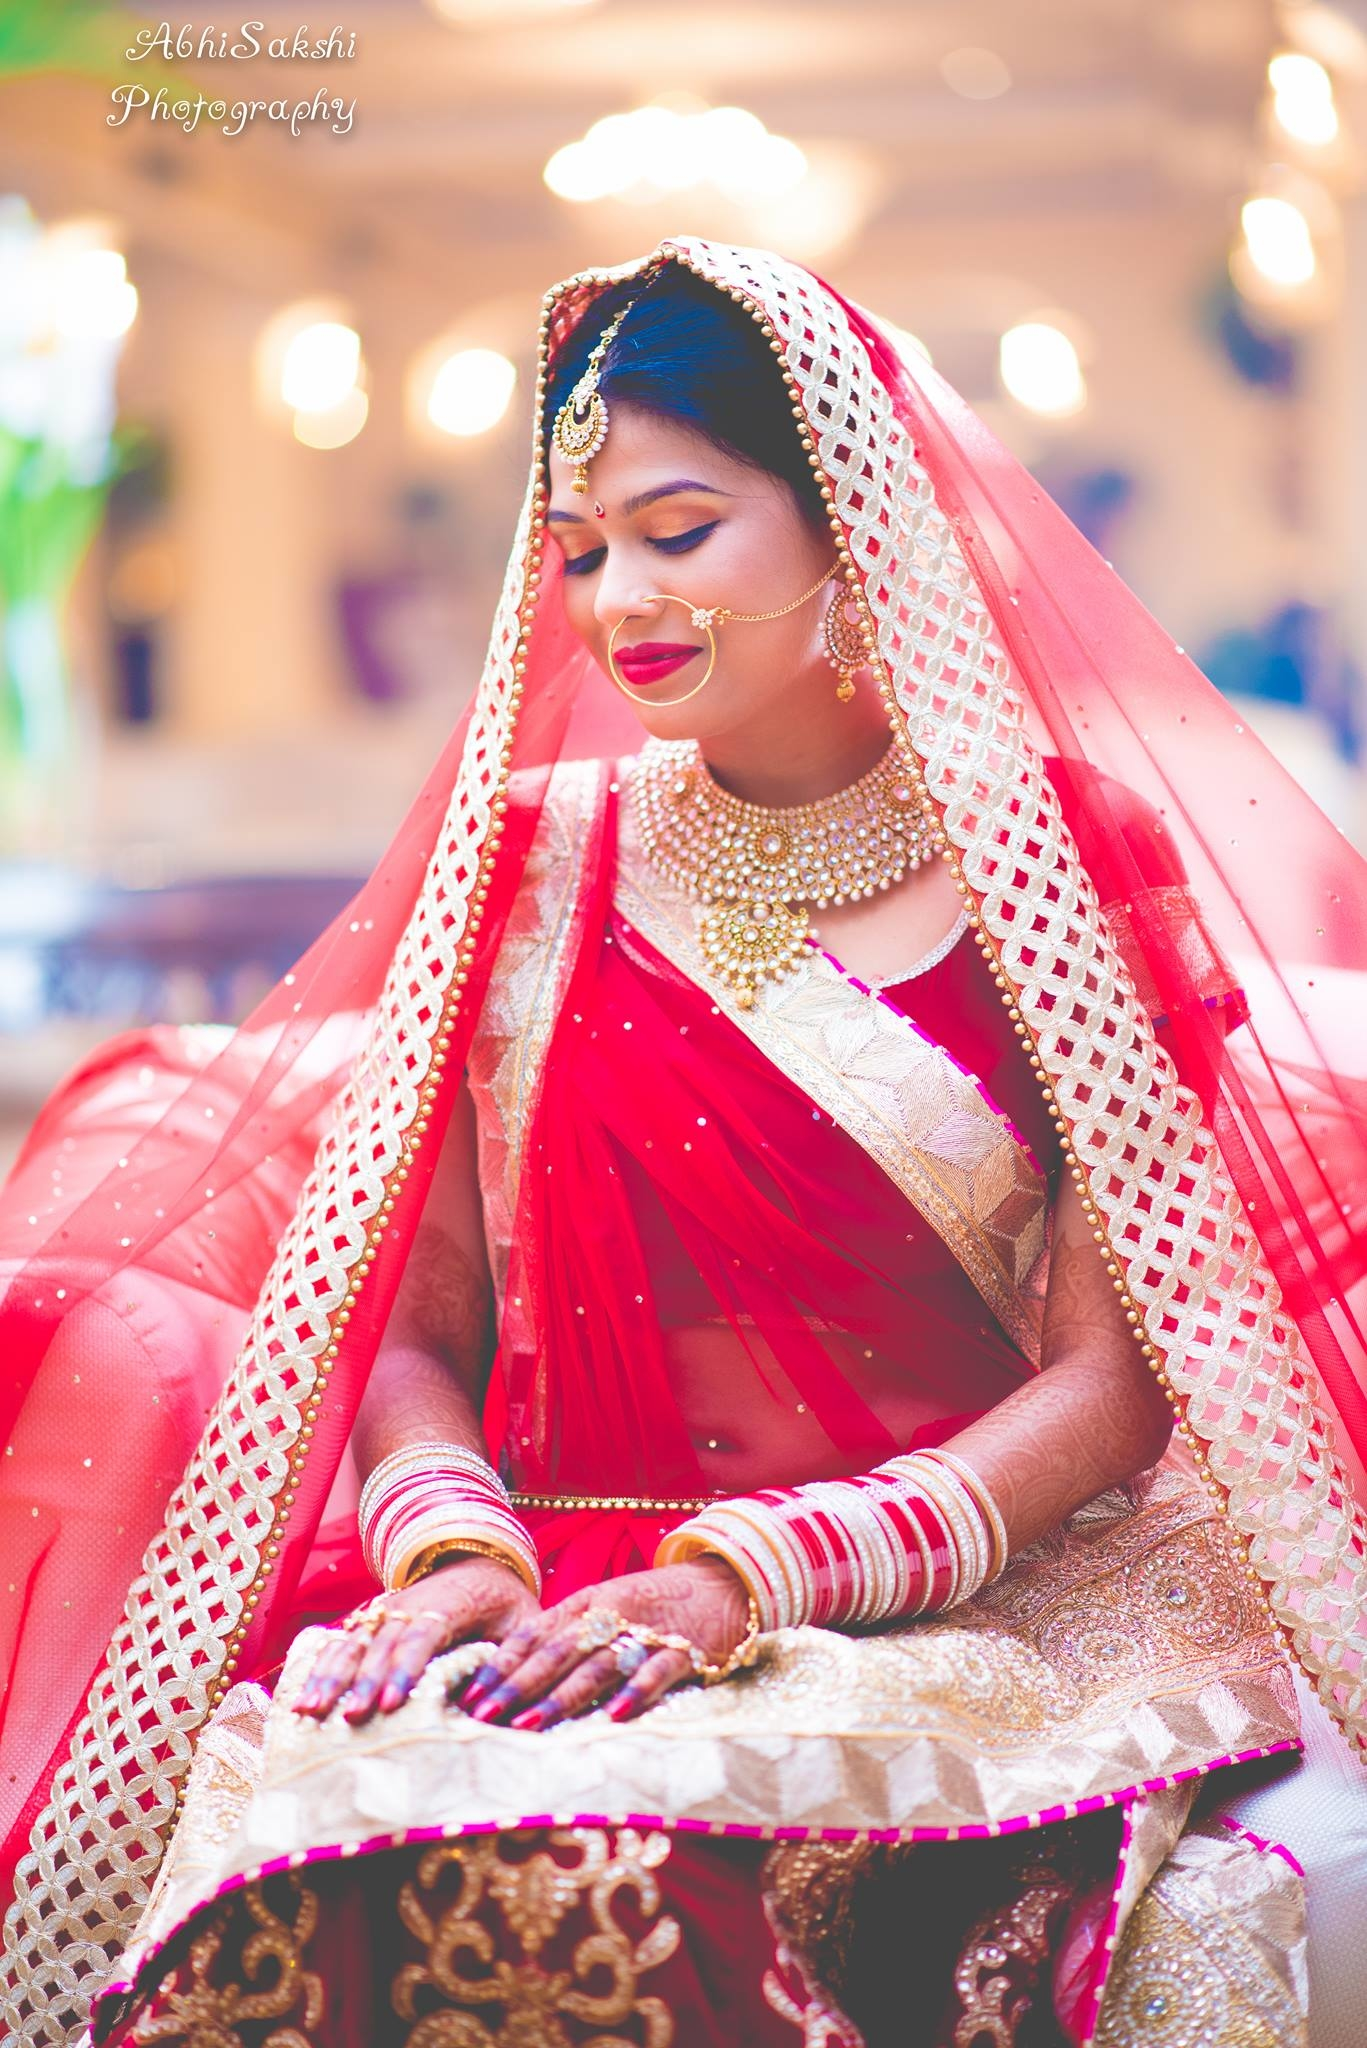 Abhi Sakshi Photography